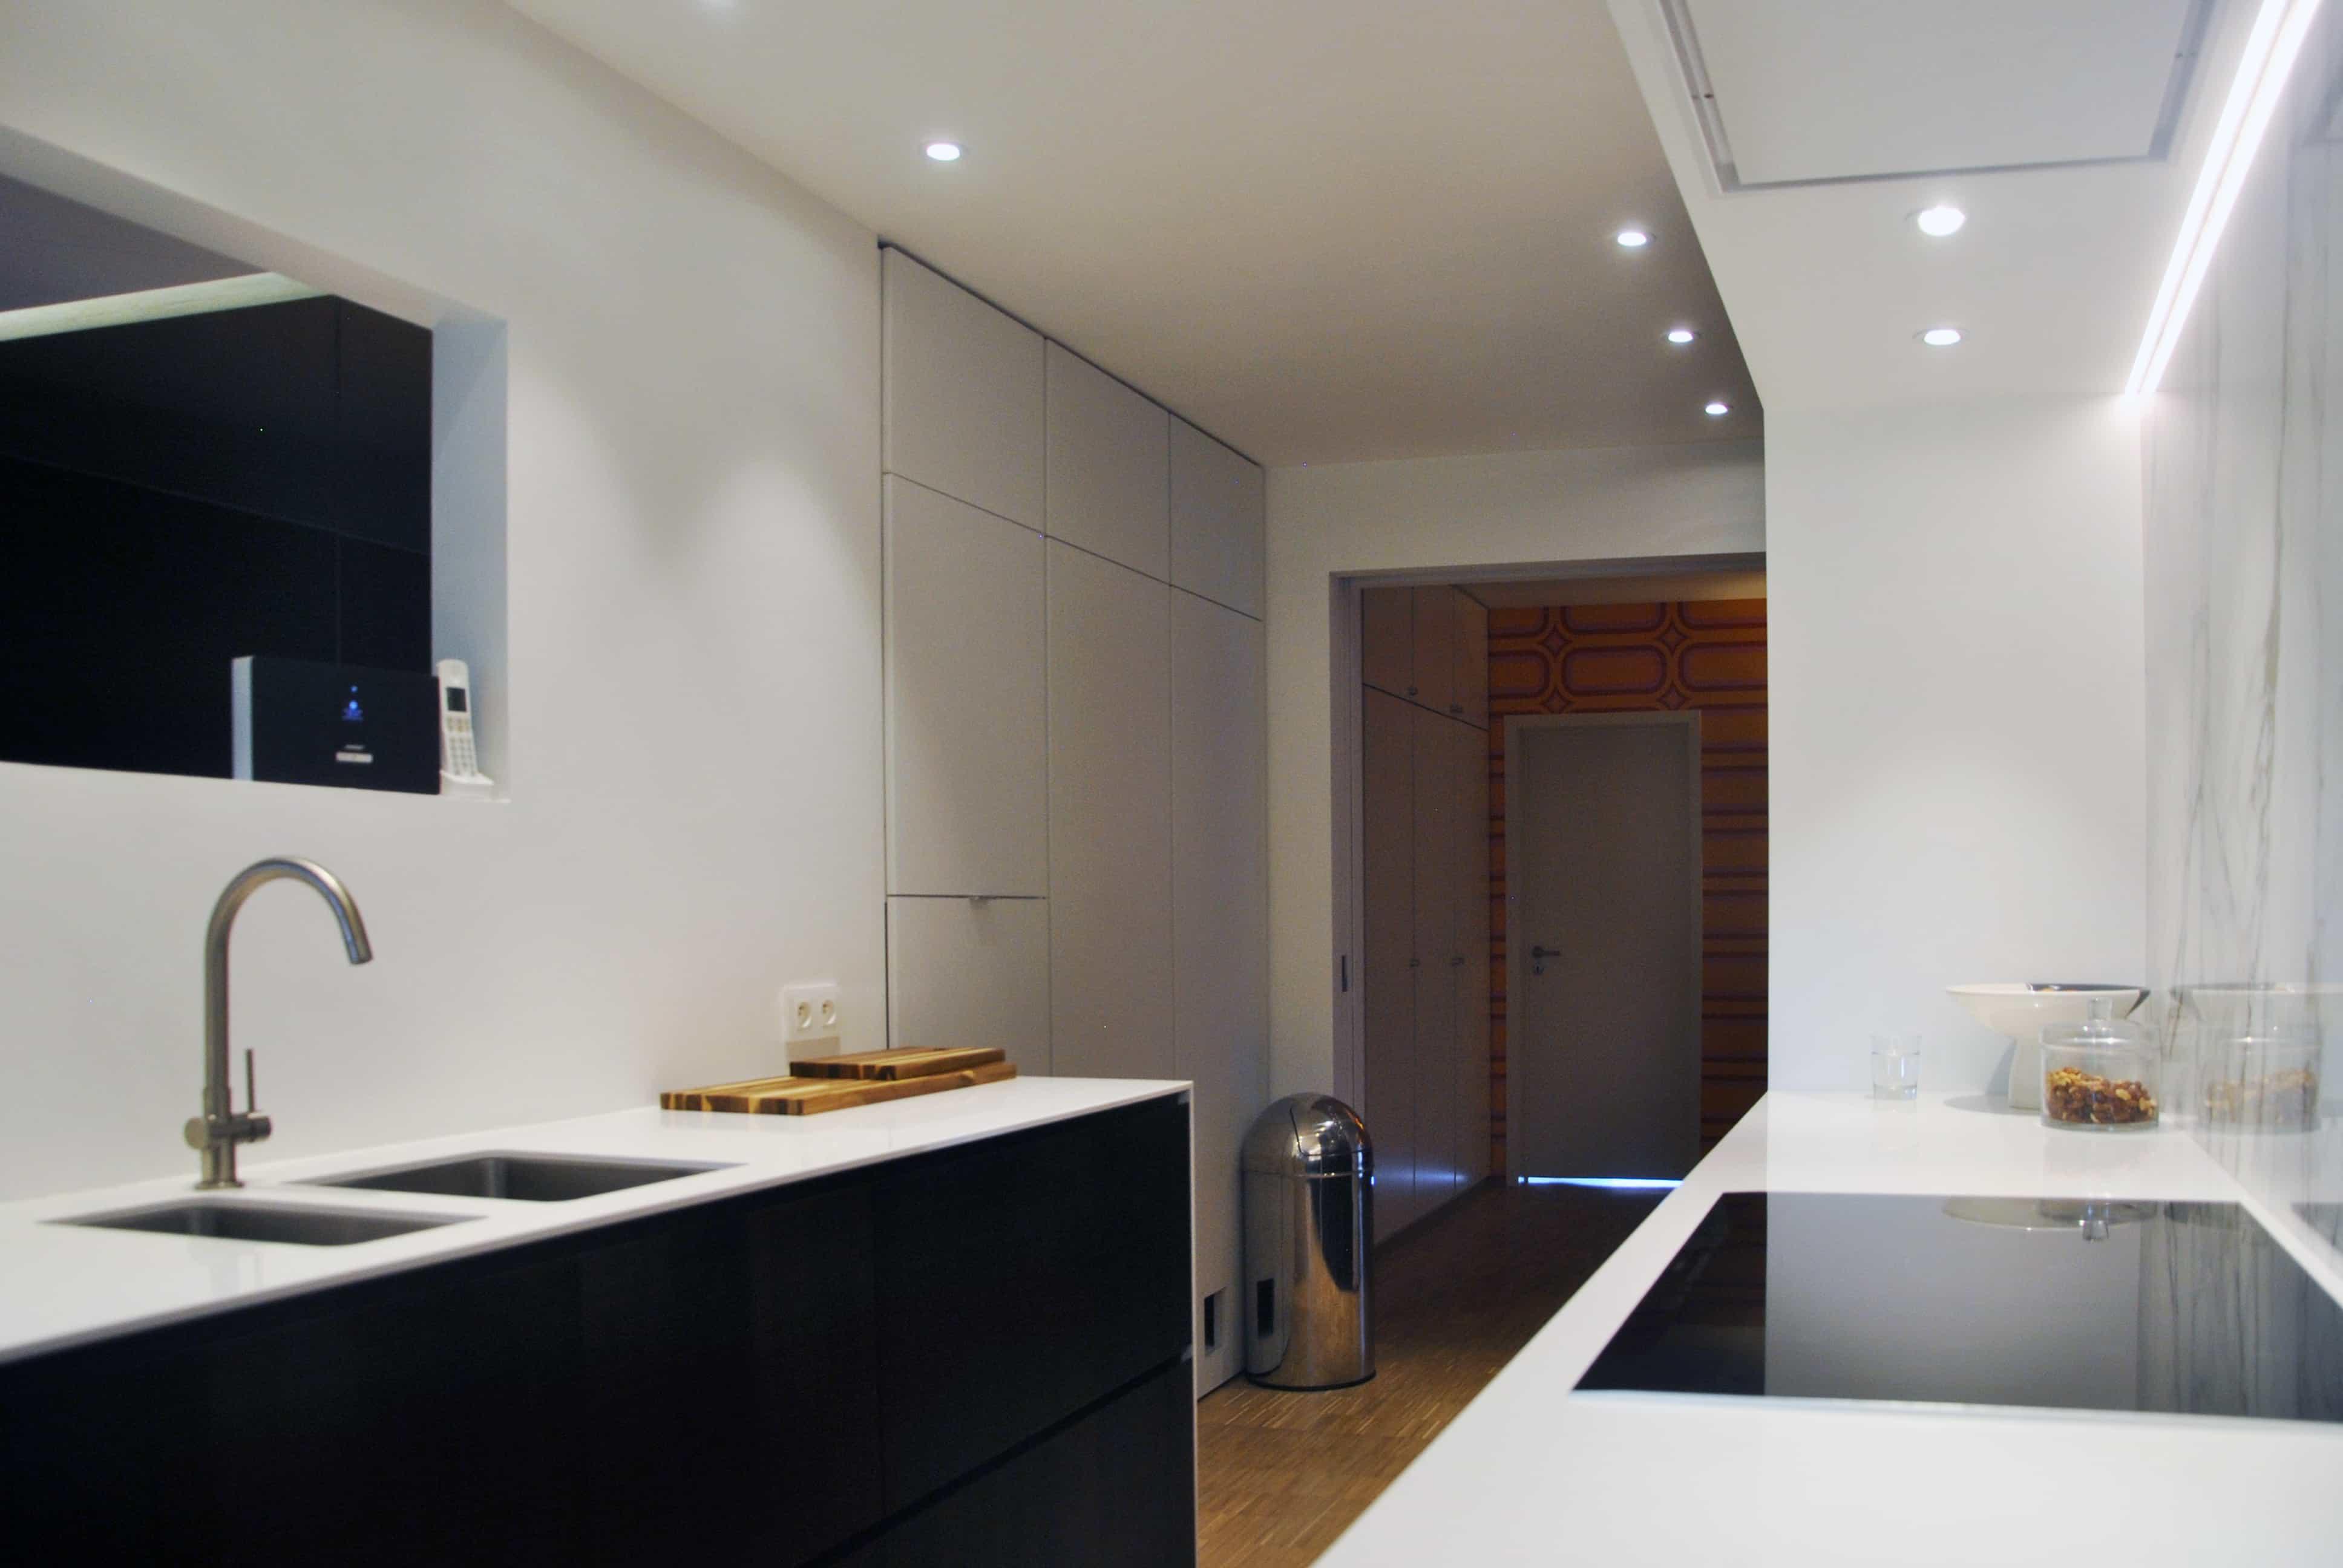 Exclusieve keuken gent dl interieur for Keuken interieur